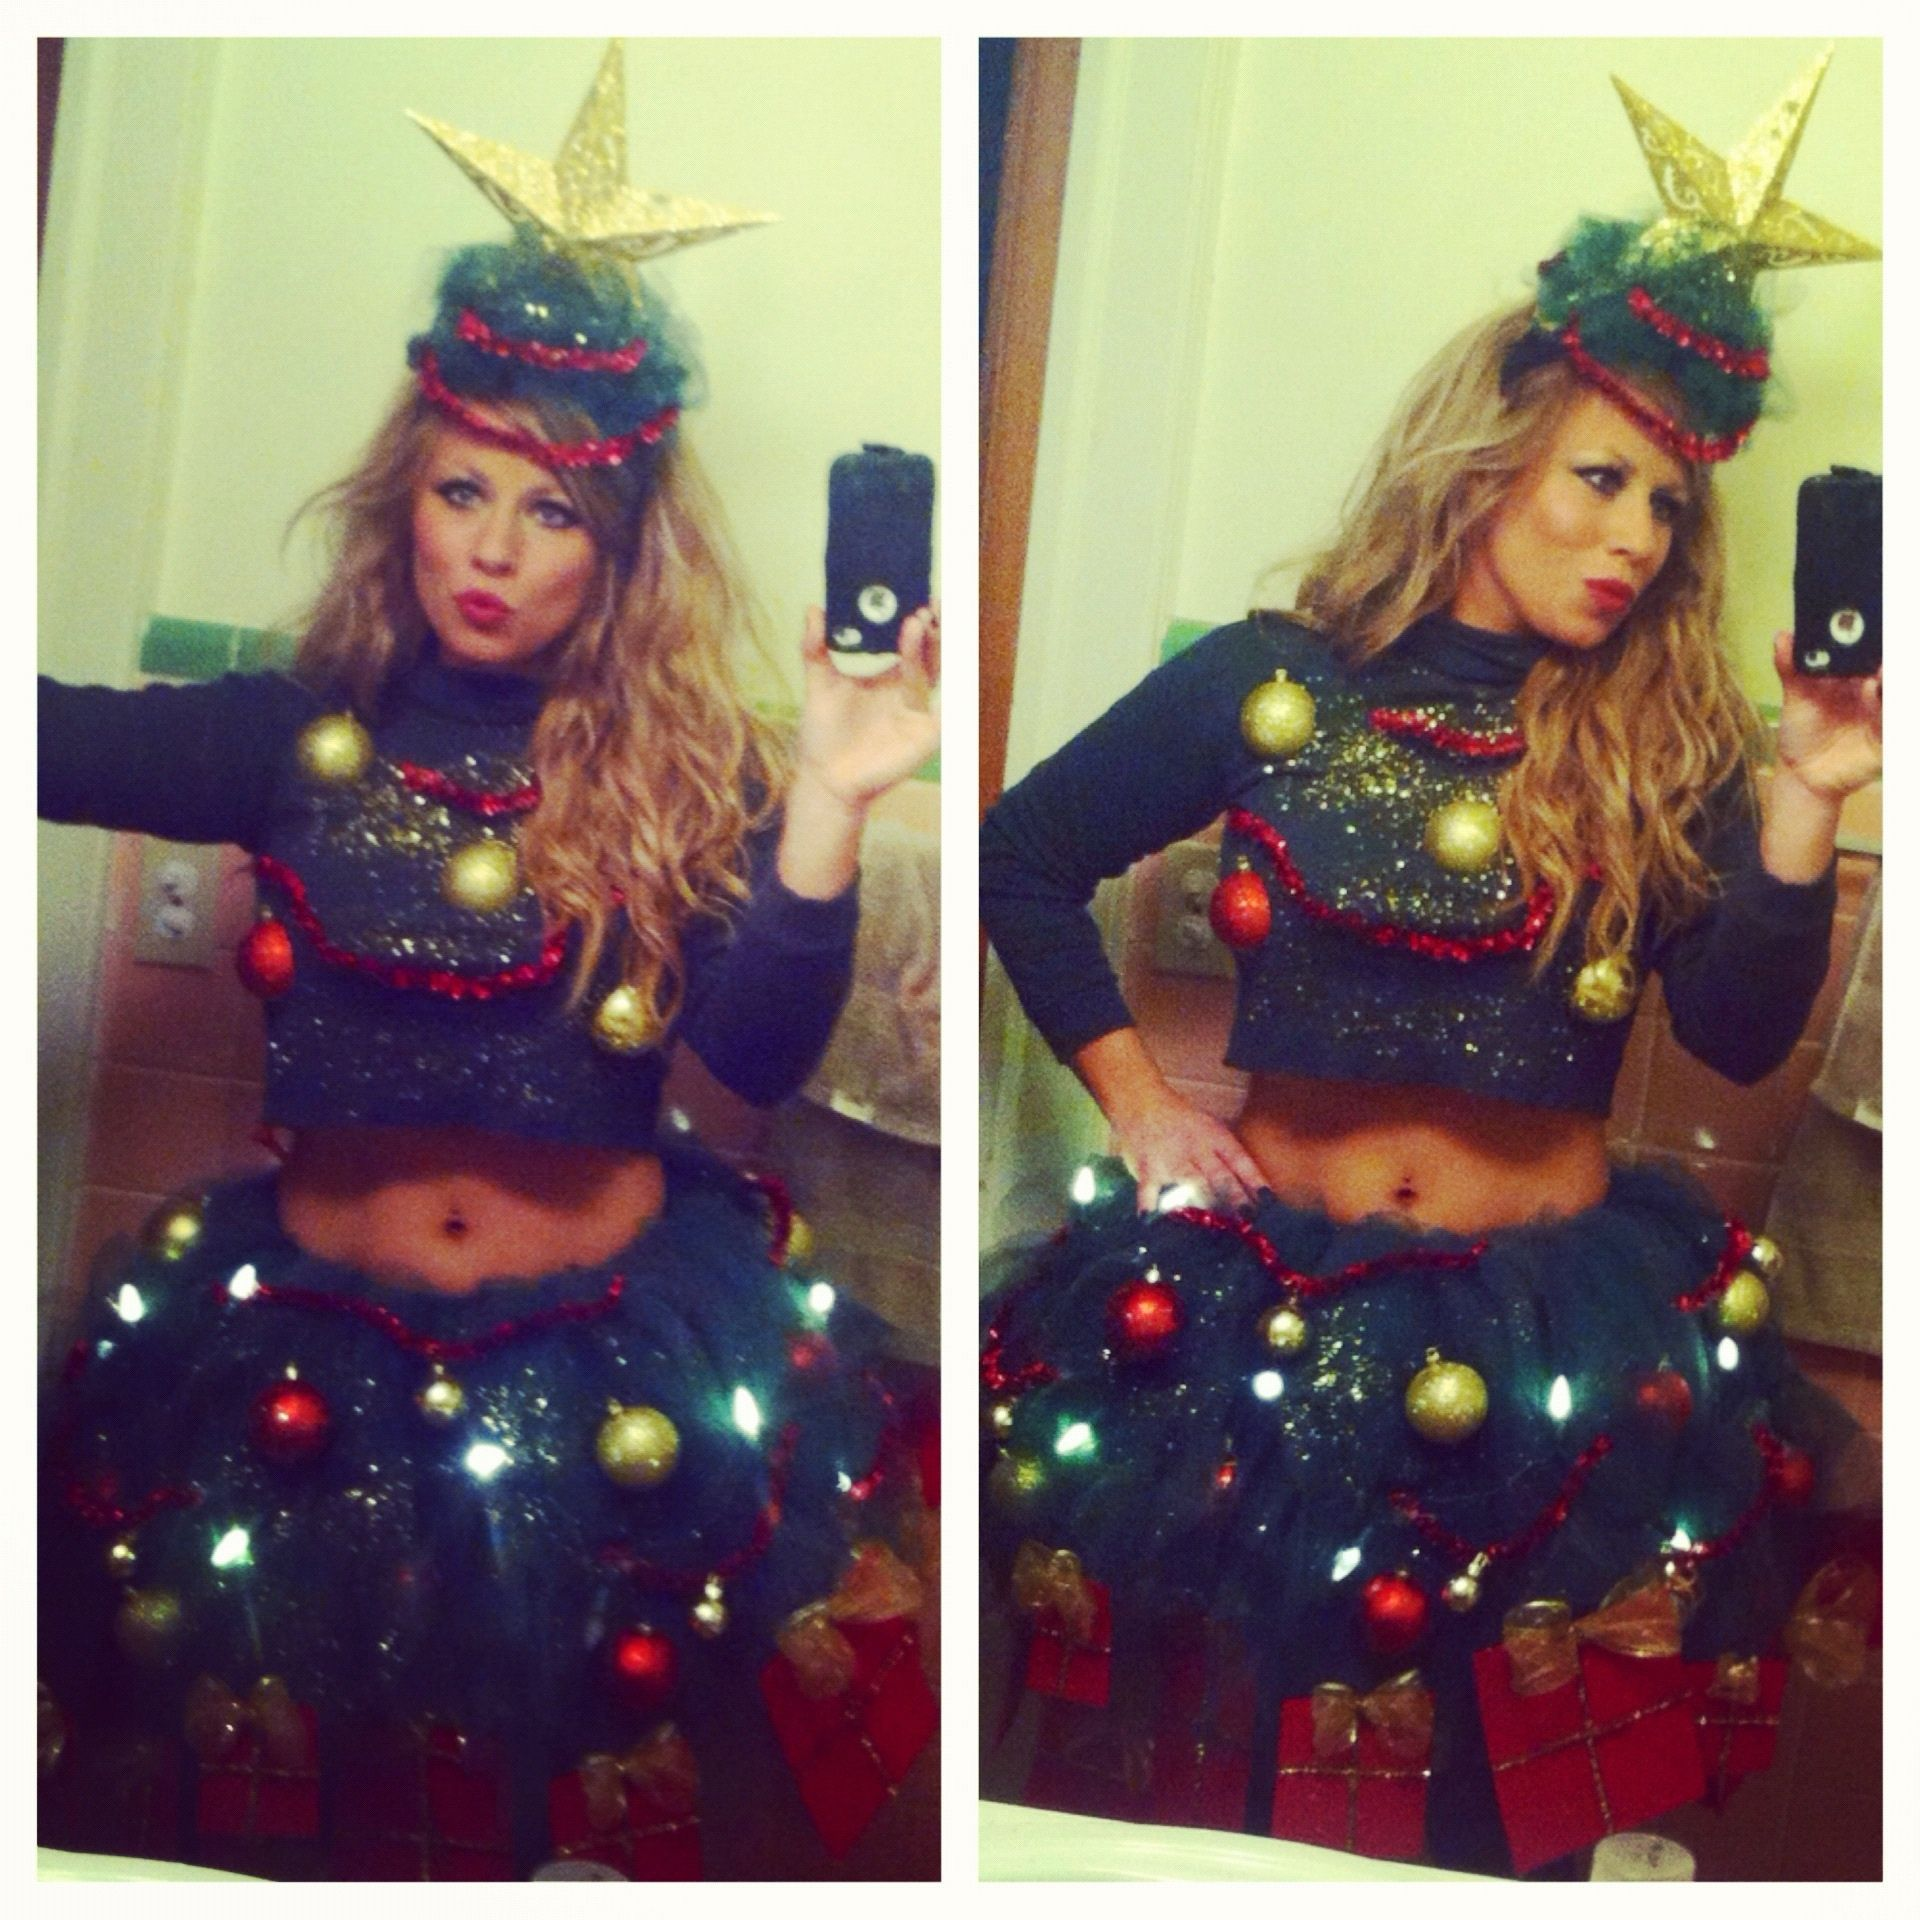 Christmas tree Halloween costume  sc 1 st  Pinterest & Christmas tree Halloween costume | Home. for the Holidays ...